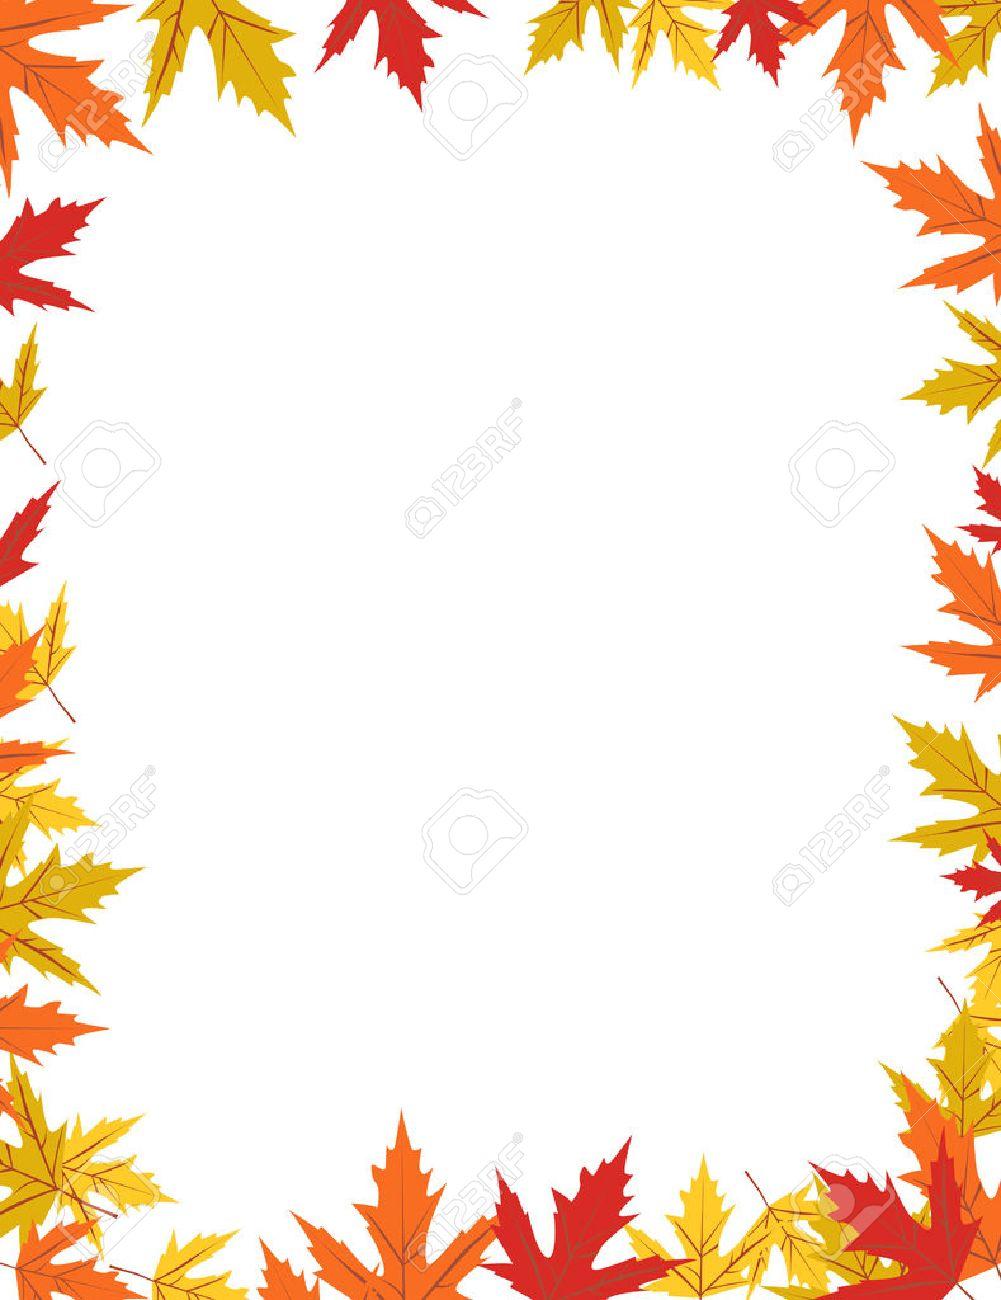 Autumn border design vector illustration - 31899673